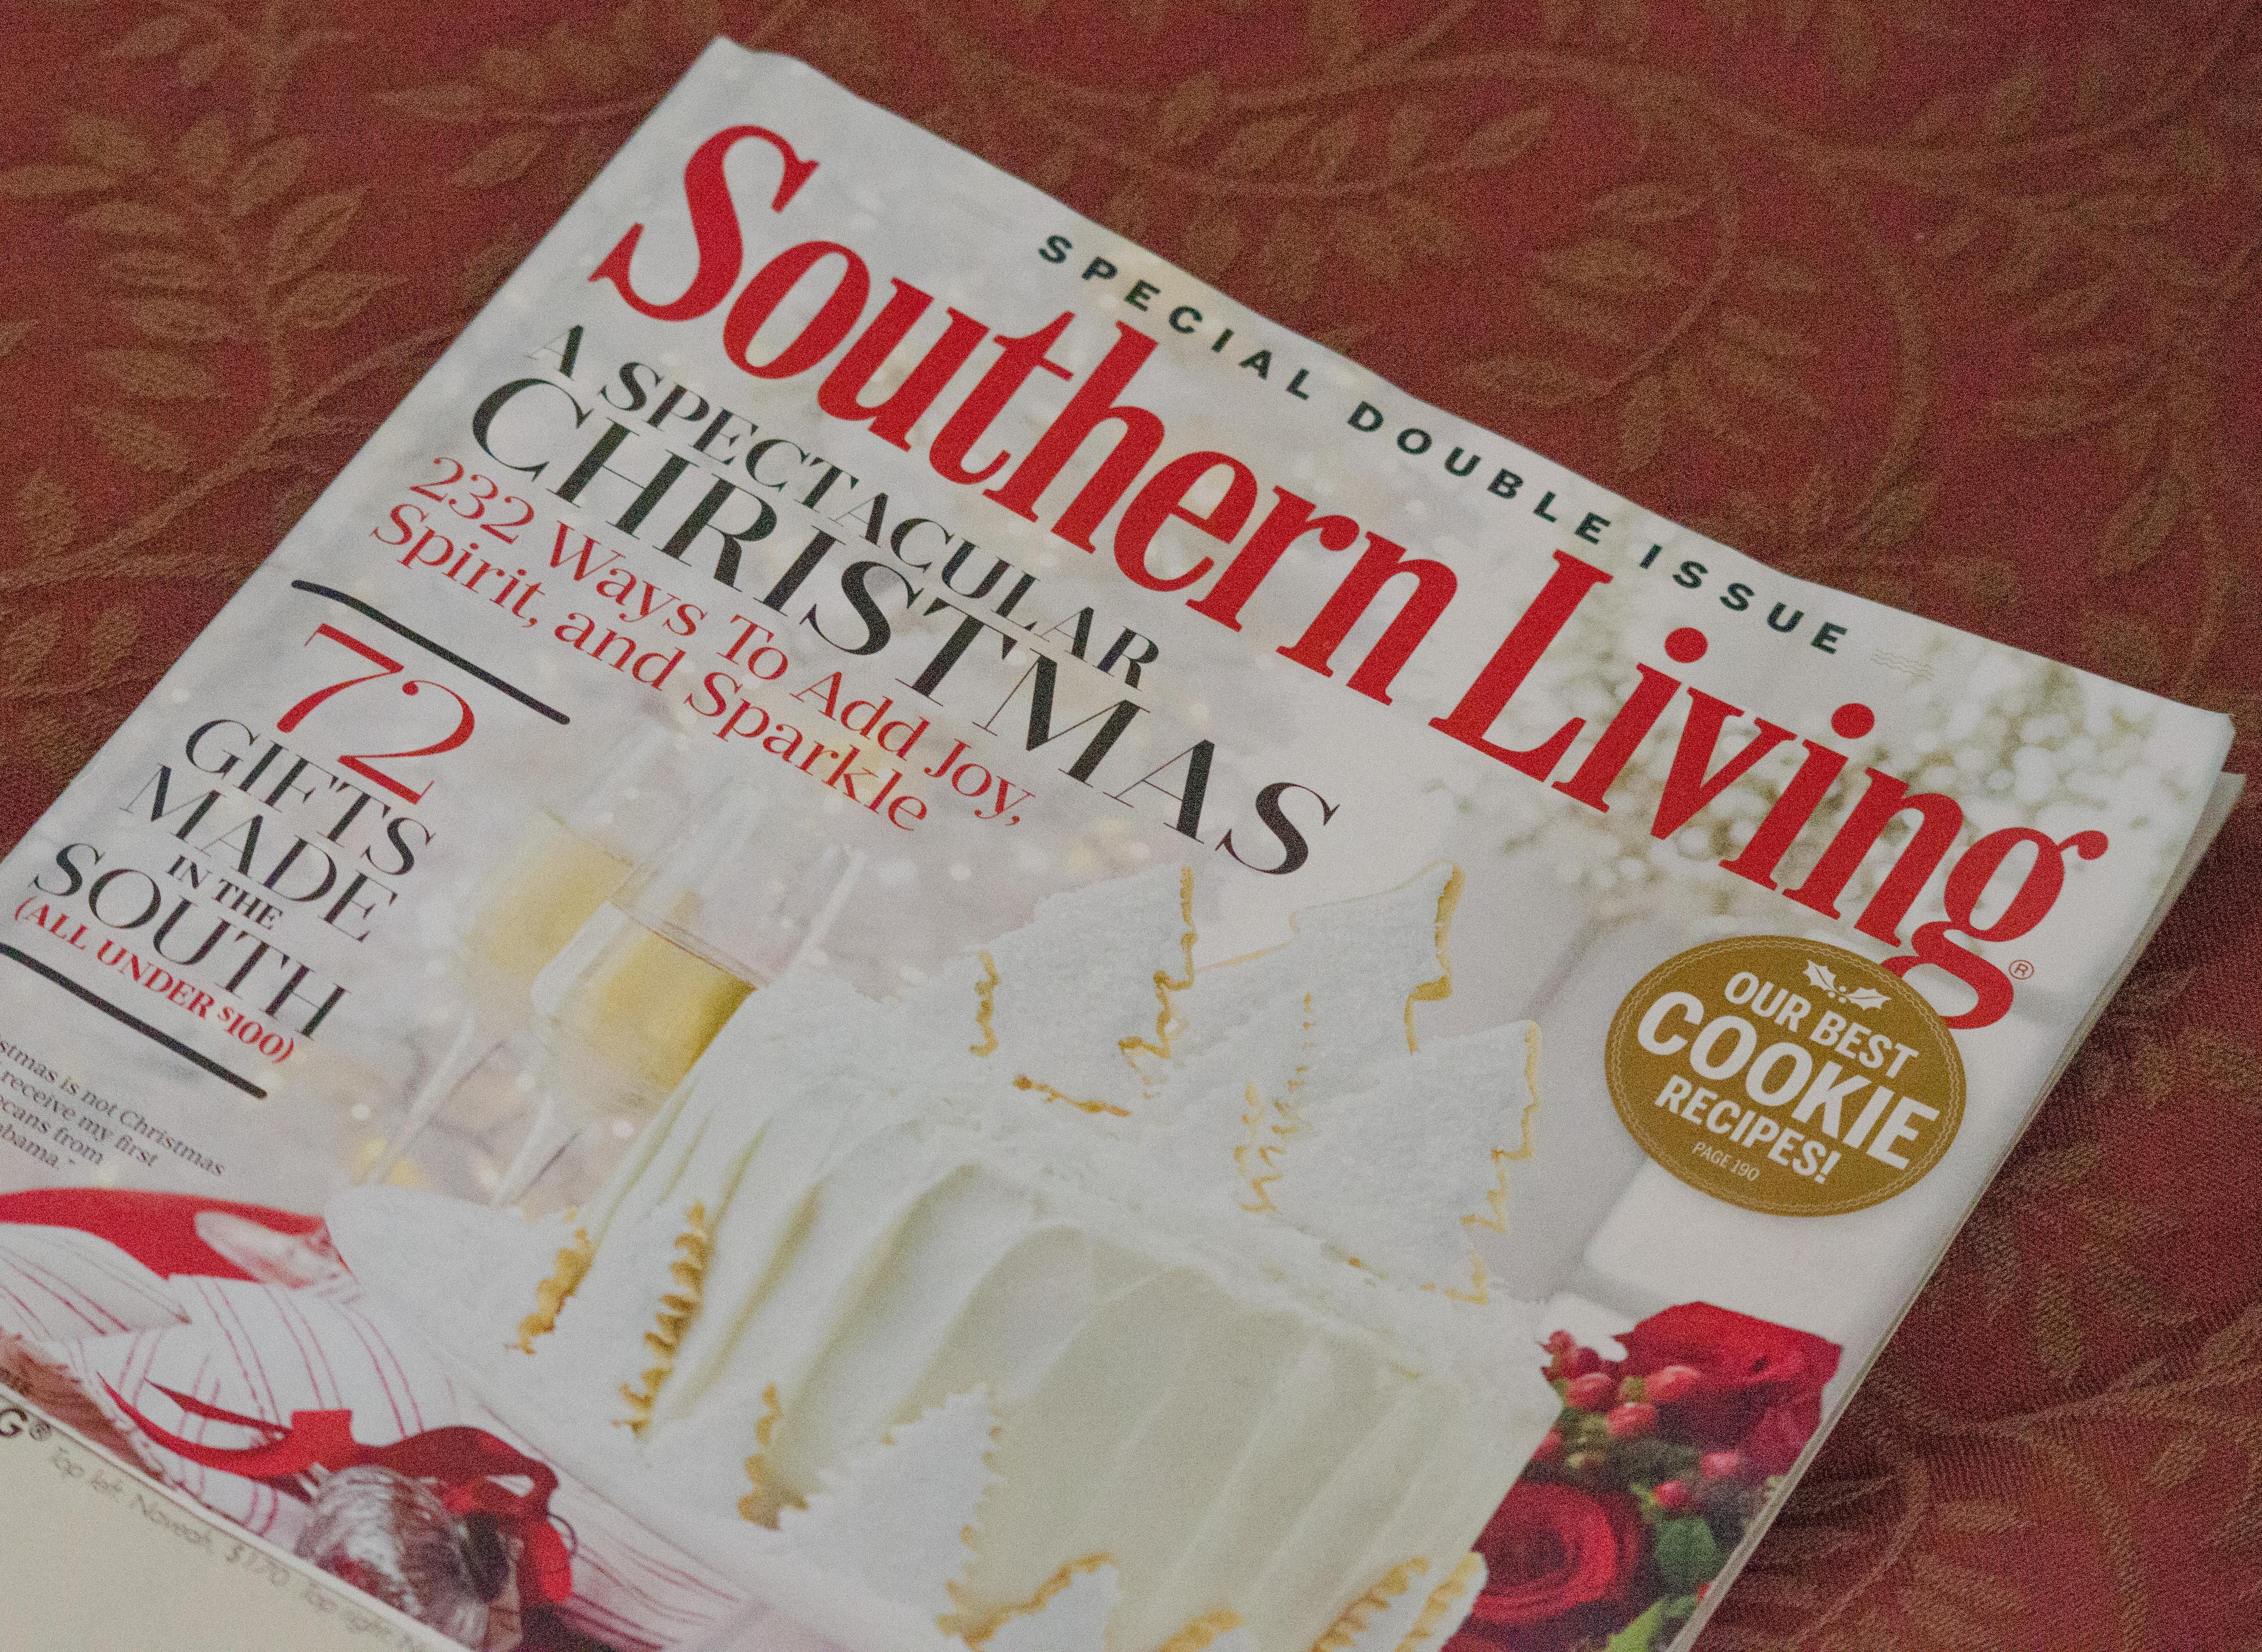 SouthernLivingChristmas2017, magazine